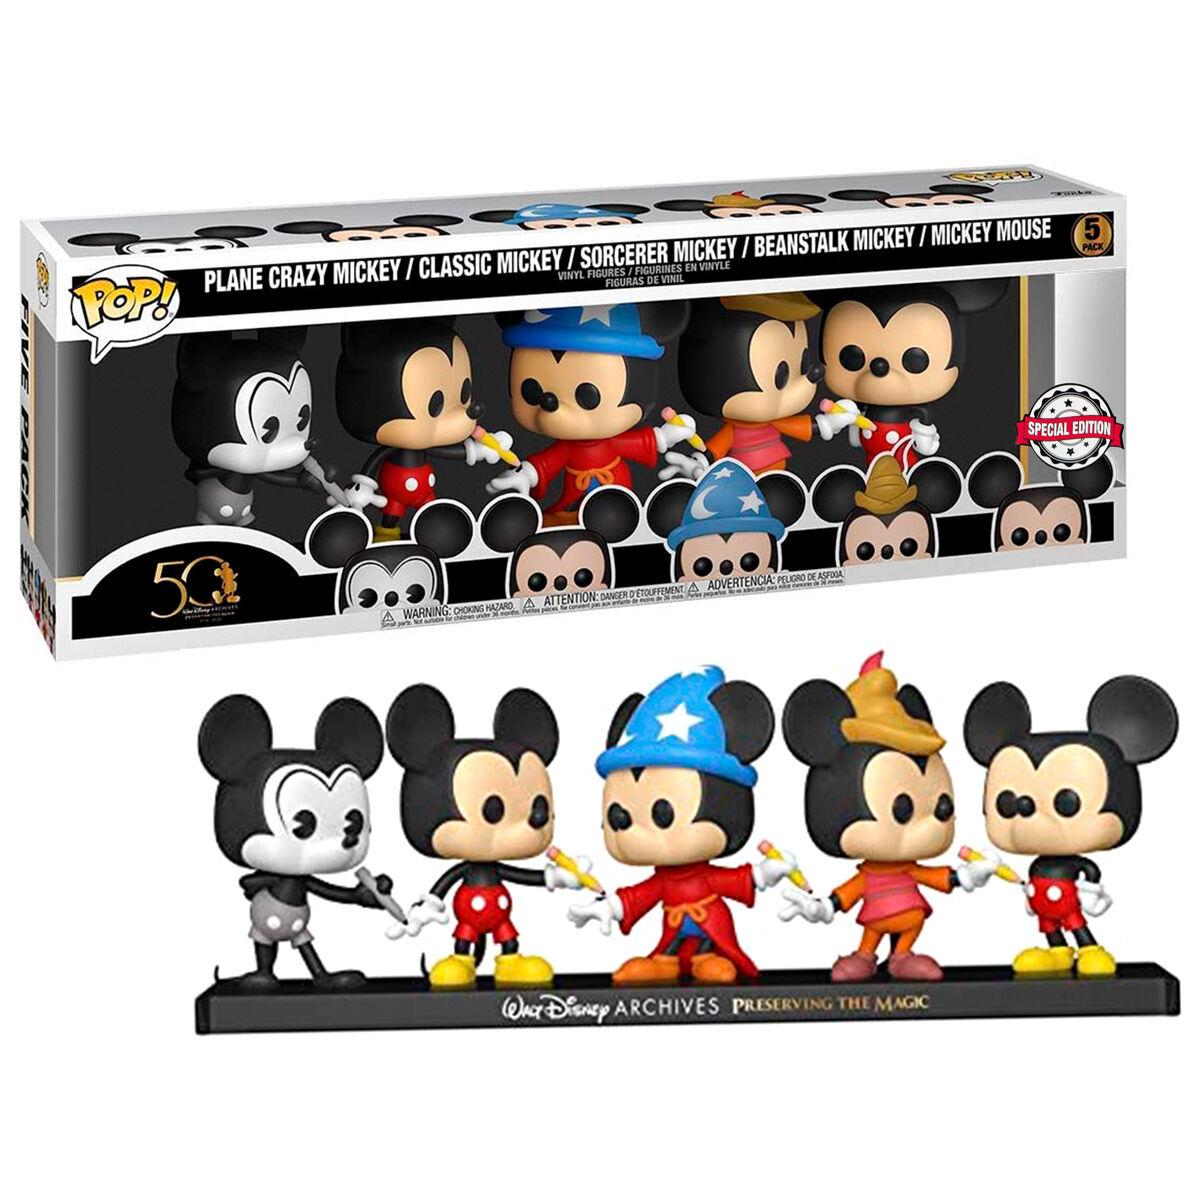 Photo du produit Pack 5 figurines Funko POP Disney Archives Mickey Exclusive